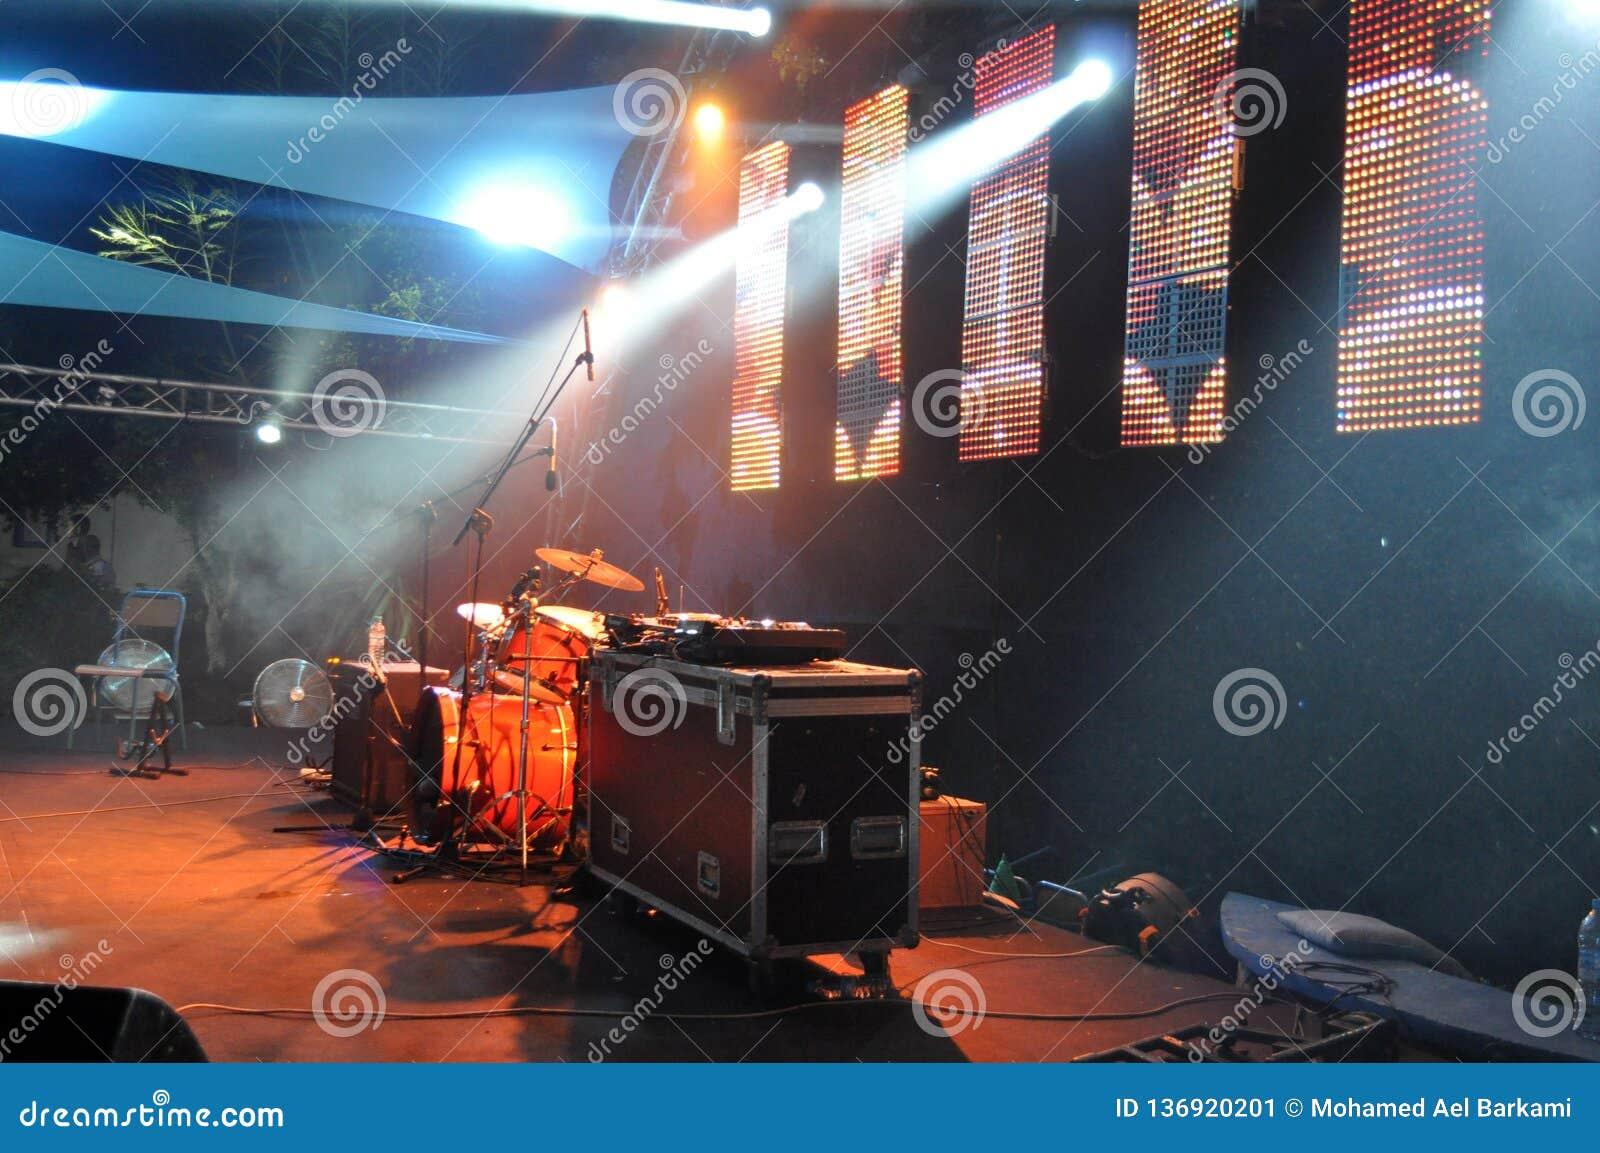 Concert - music festival - Image